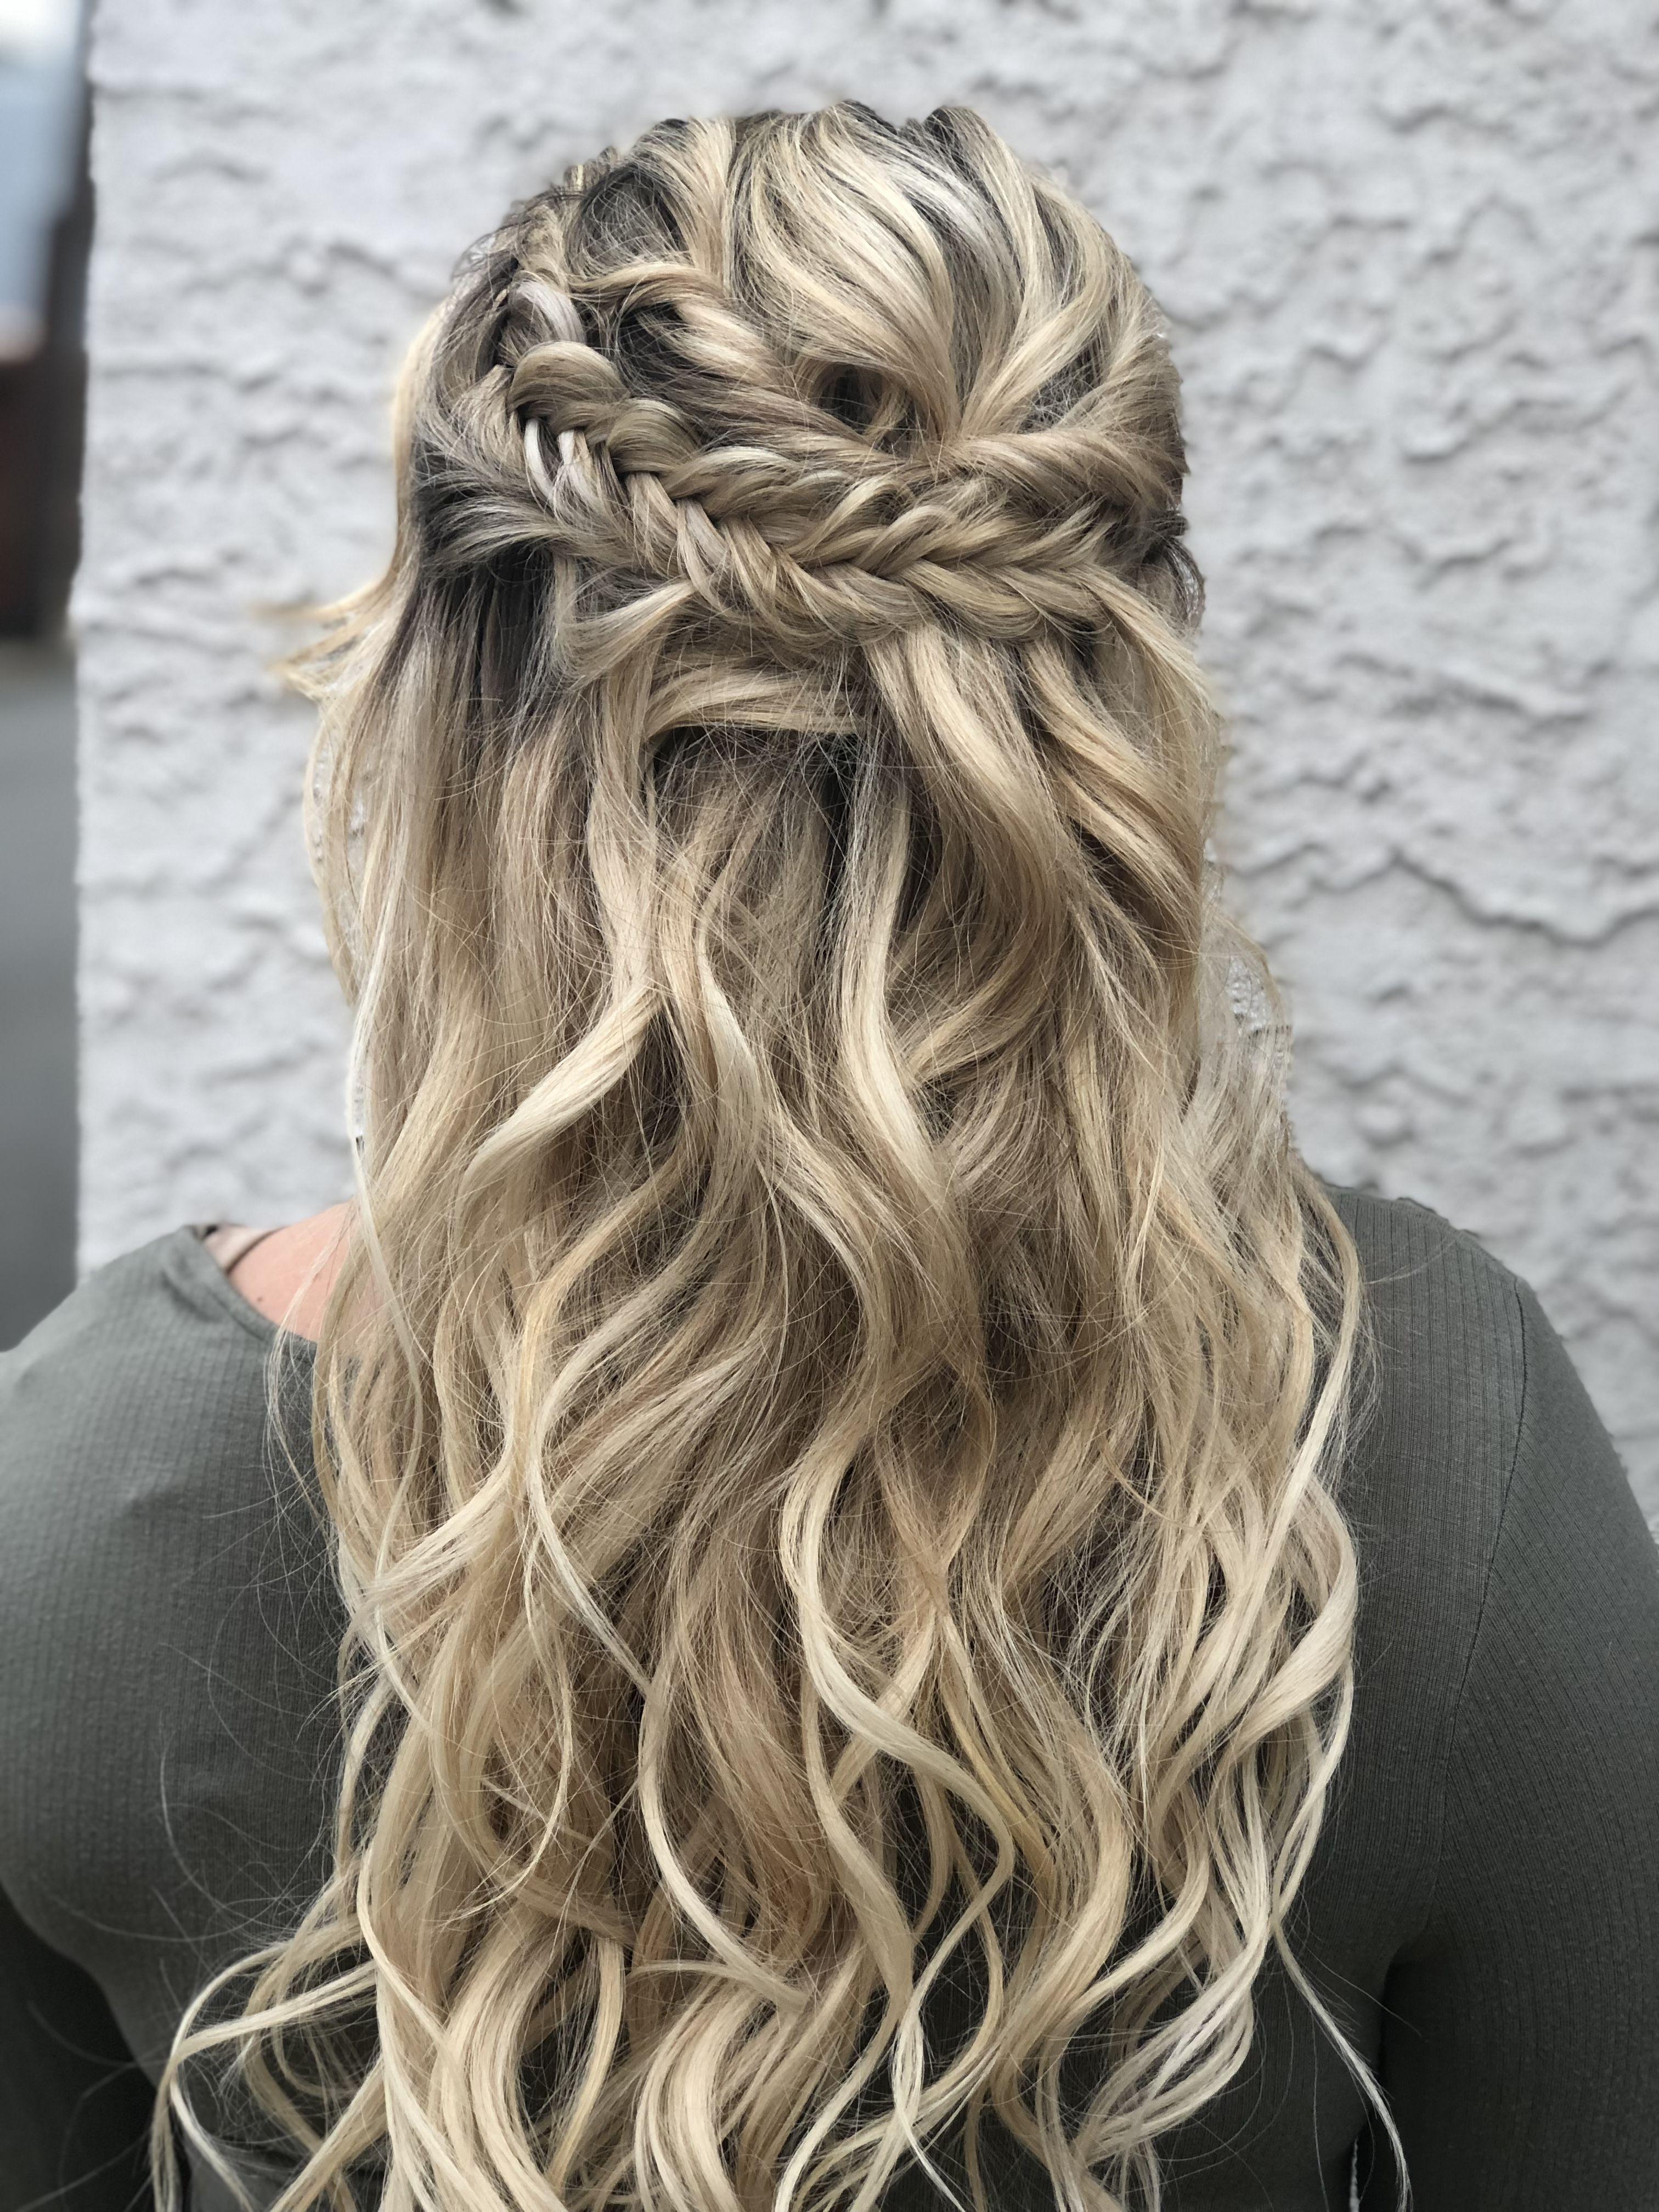 2020 Popular Half-Up Half-Down Boho Braided Hairstyles